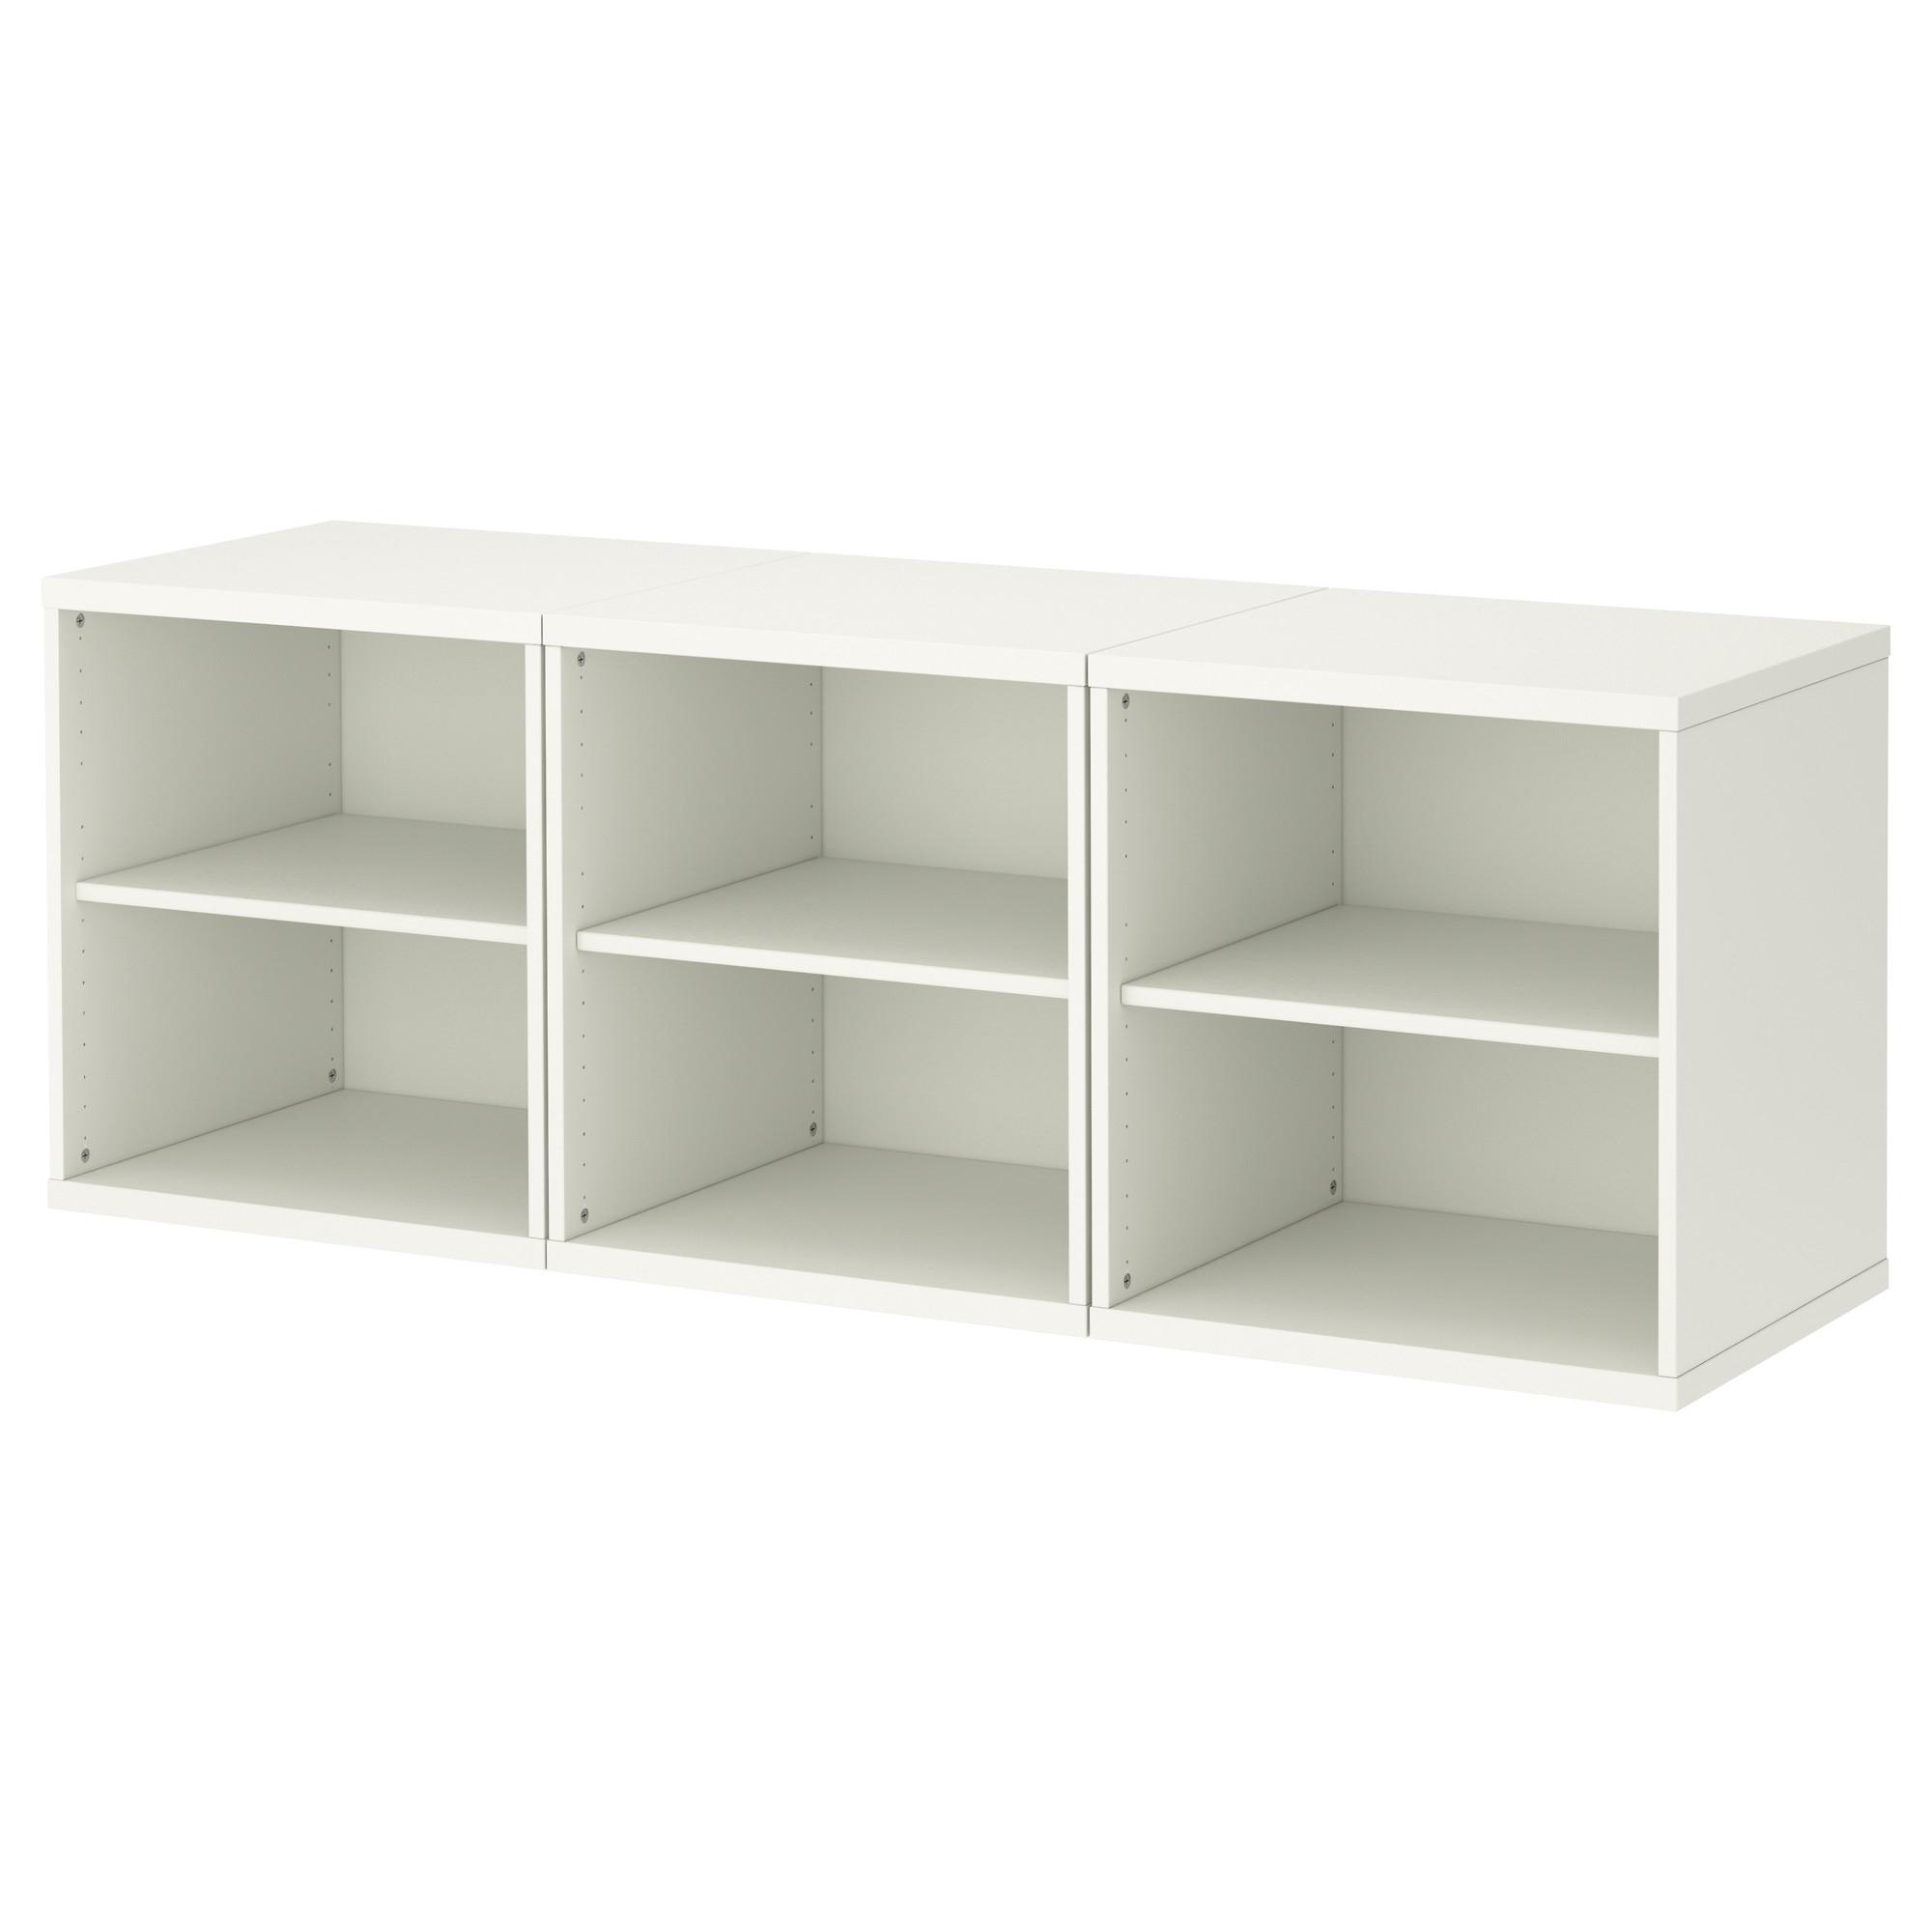 Stuva combinaci n de almacenaje estantes for Almacenaje bano ikea